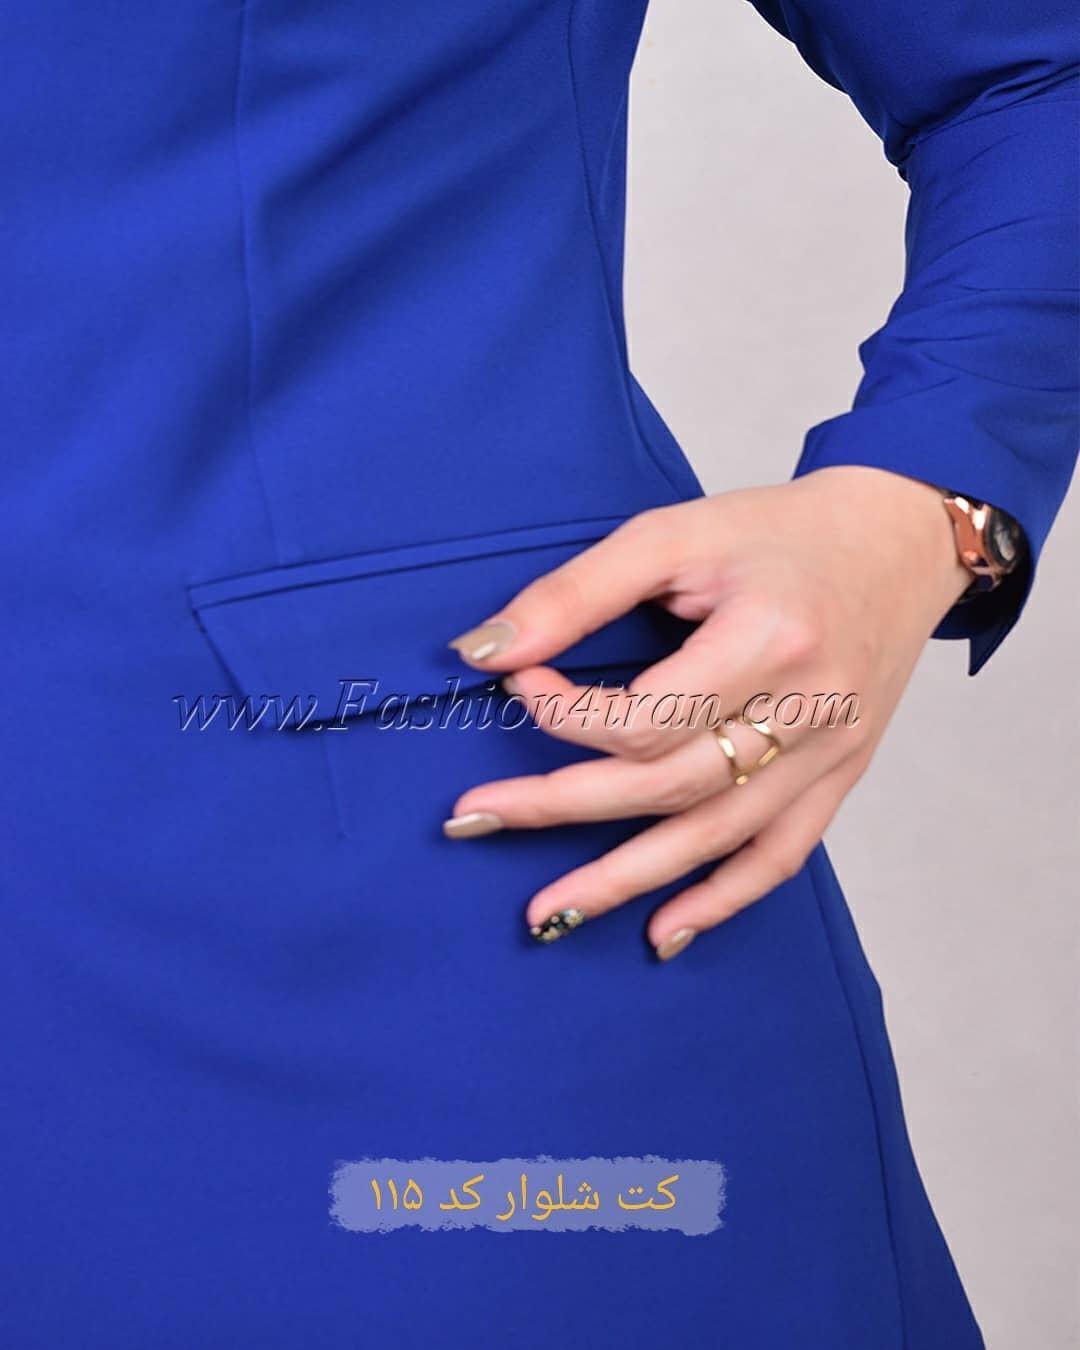 مدل مانتوی اداری رنگ آبی